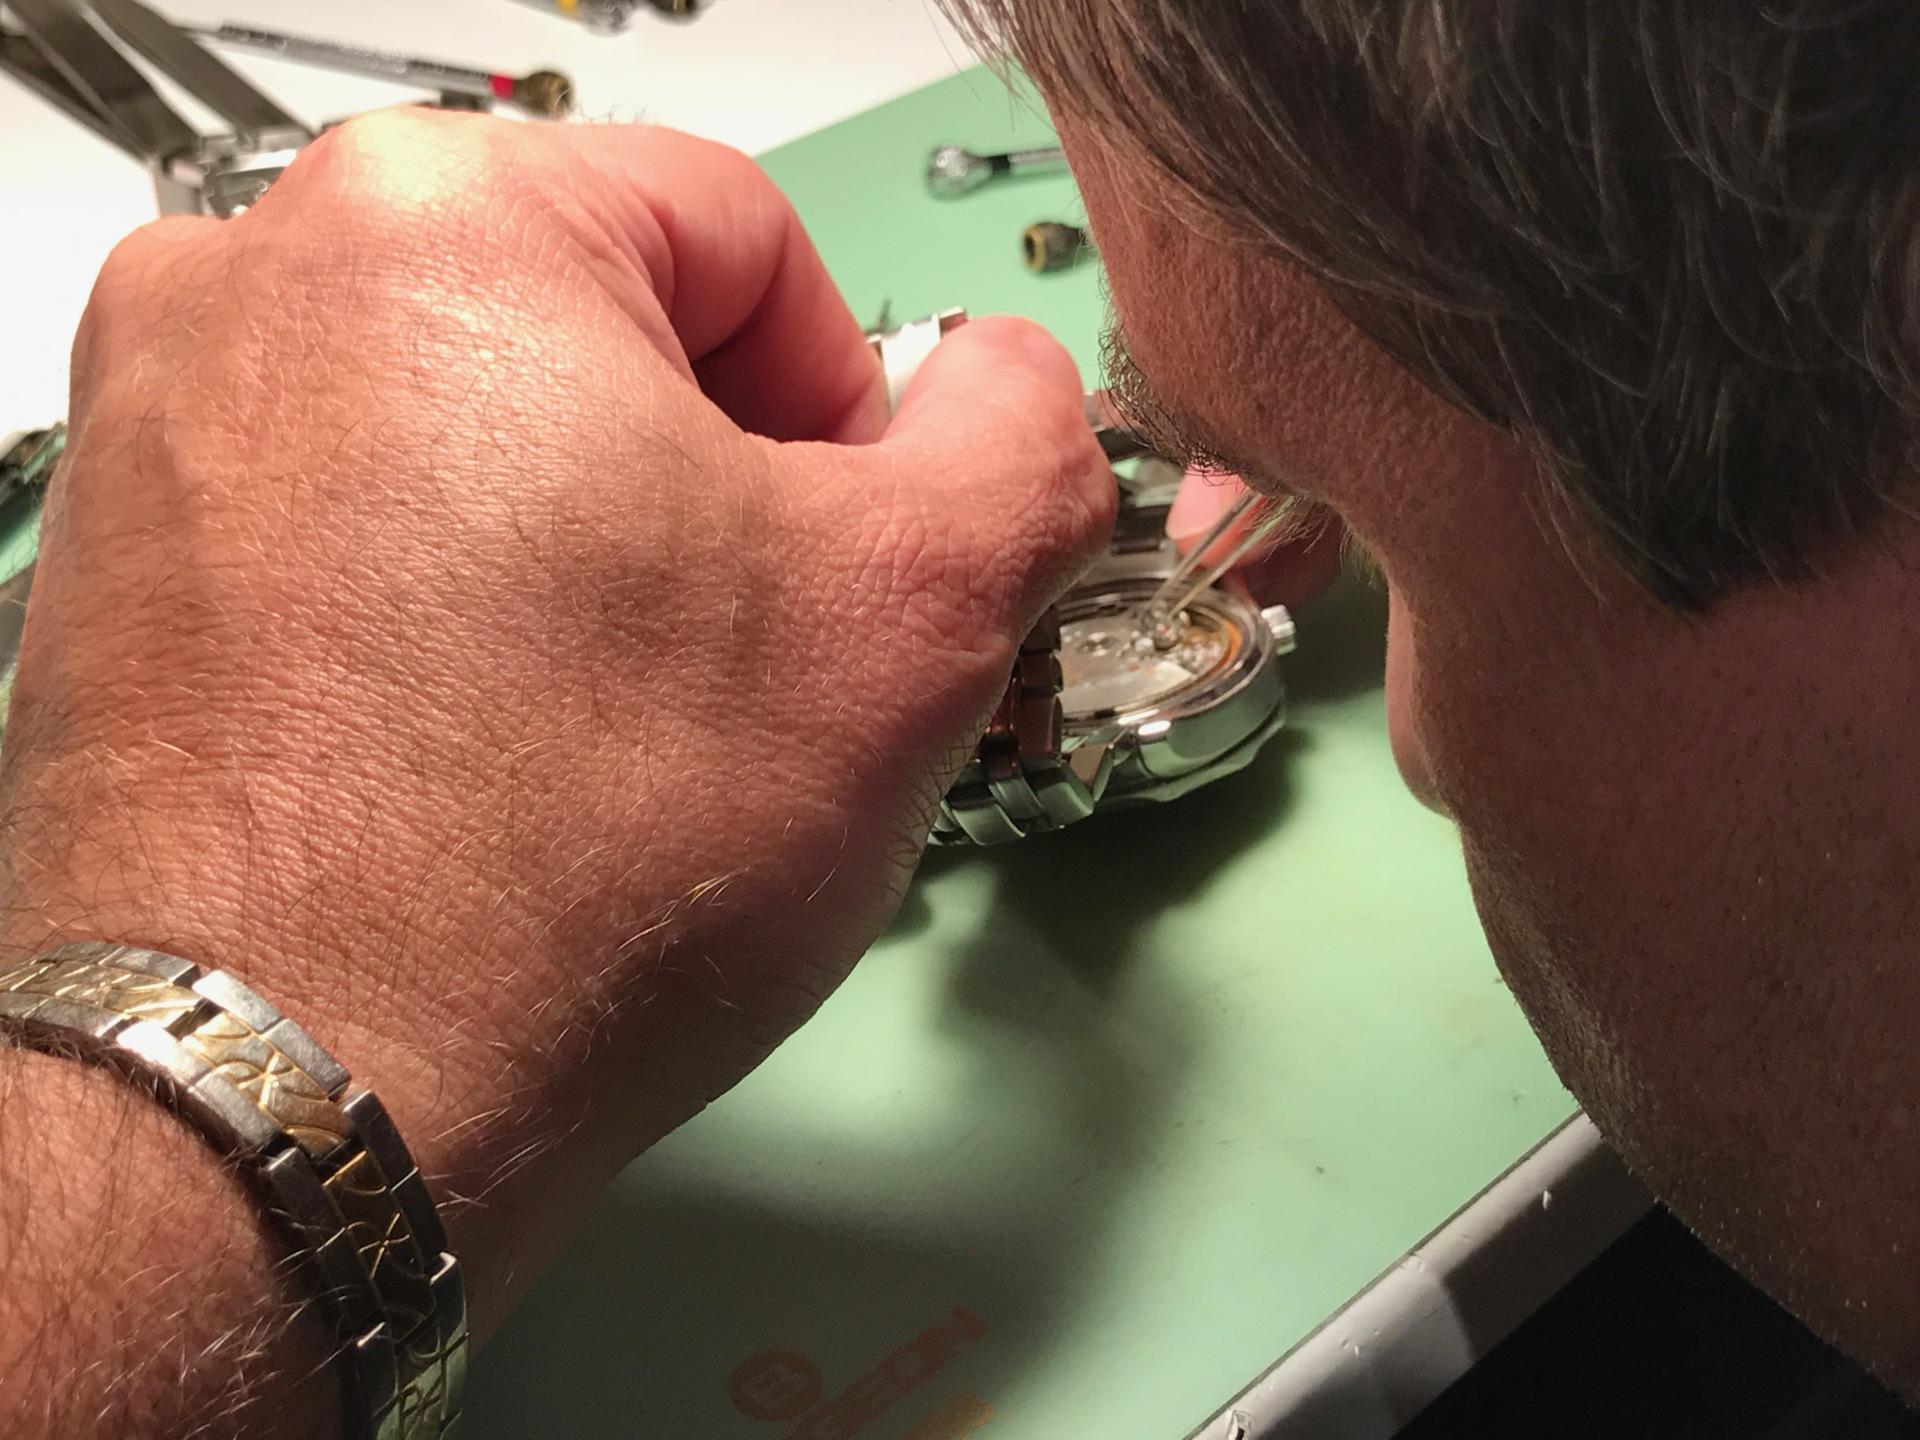 Rolex, Omega, Cartier, Breitling, Tag Heur